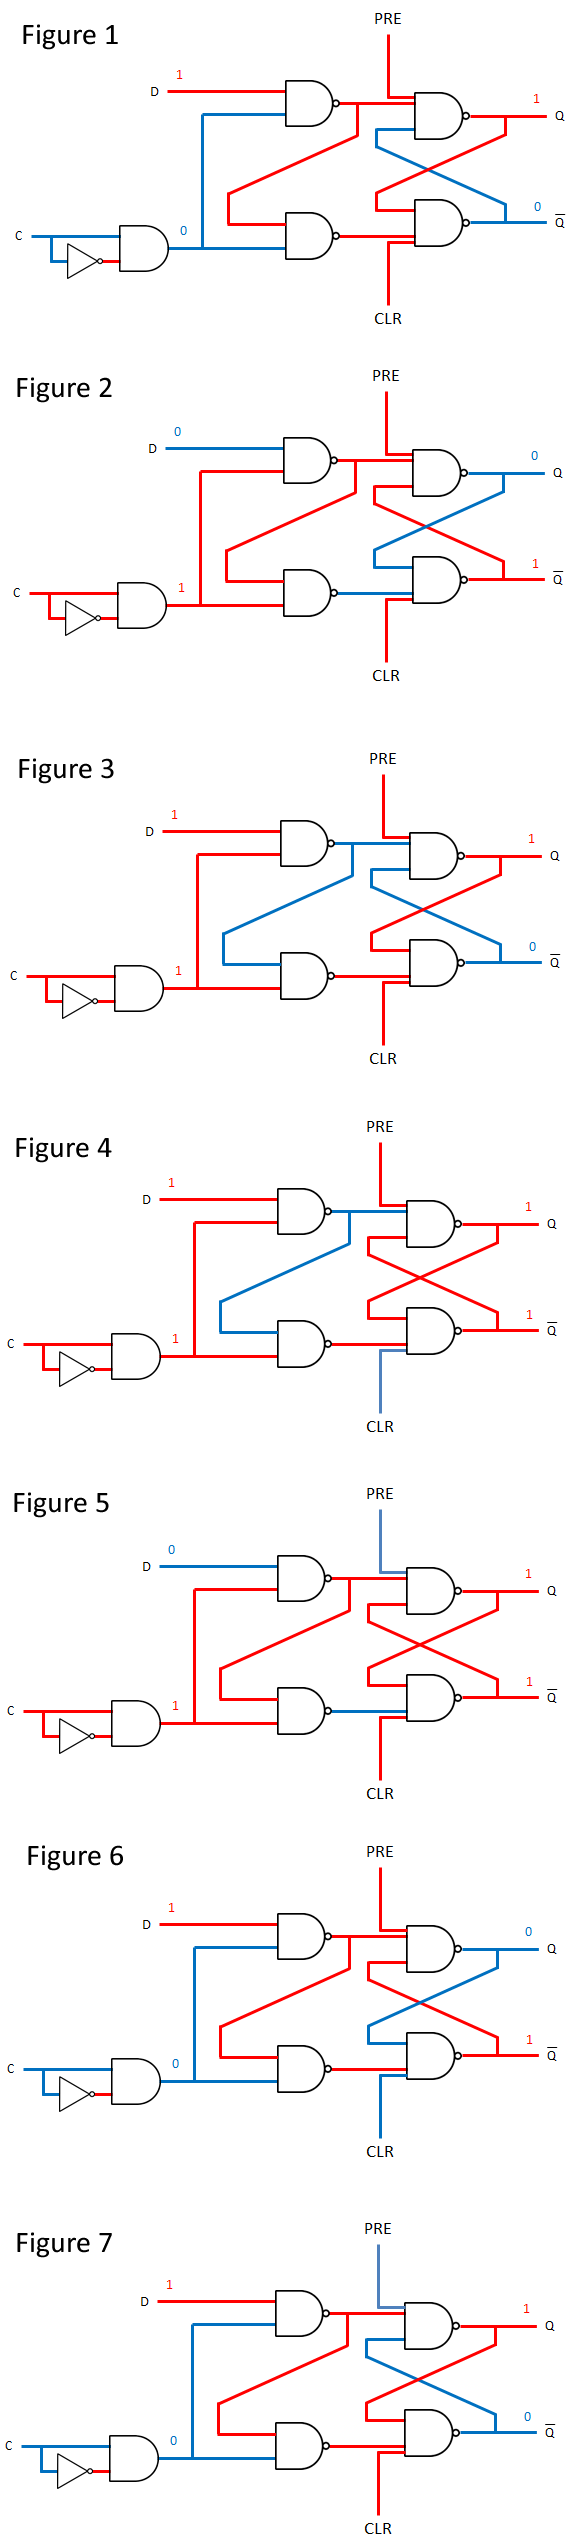 hight resolution of enter image description here digital logic circuit analysis integrated circuit flipflop latch